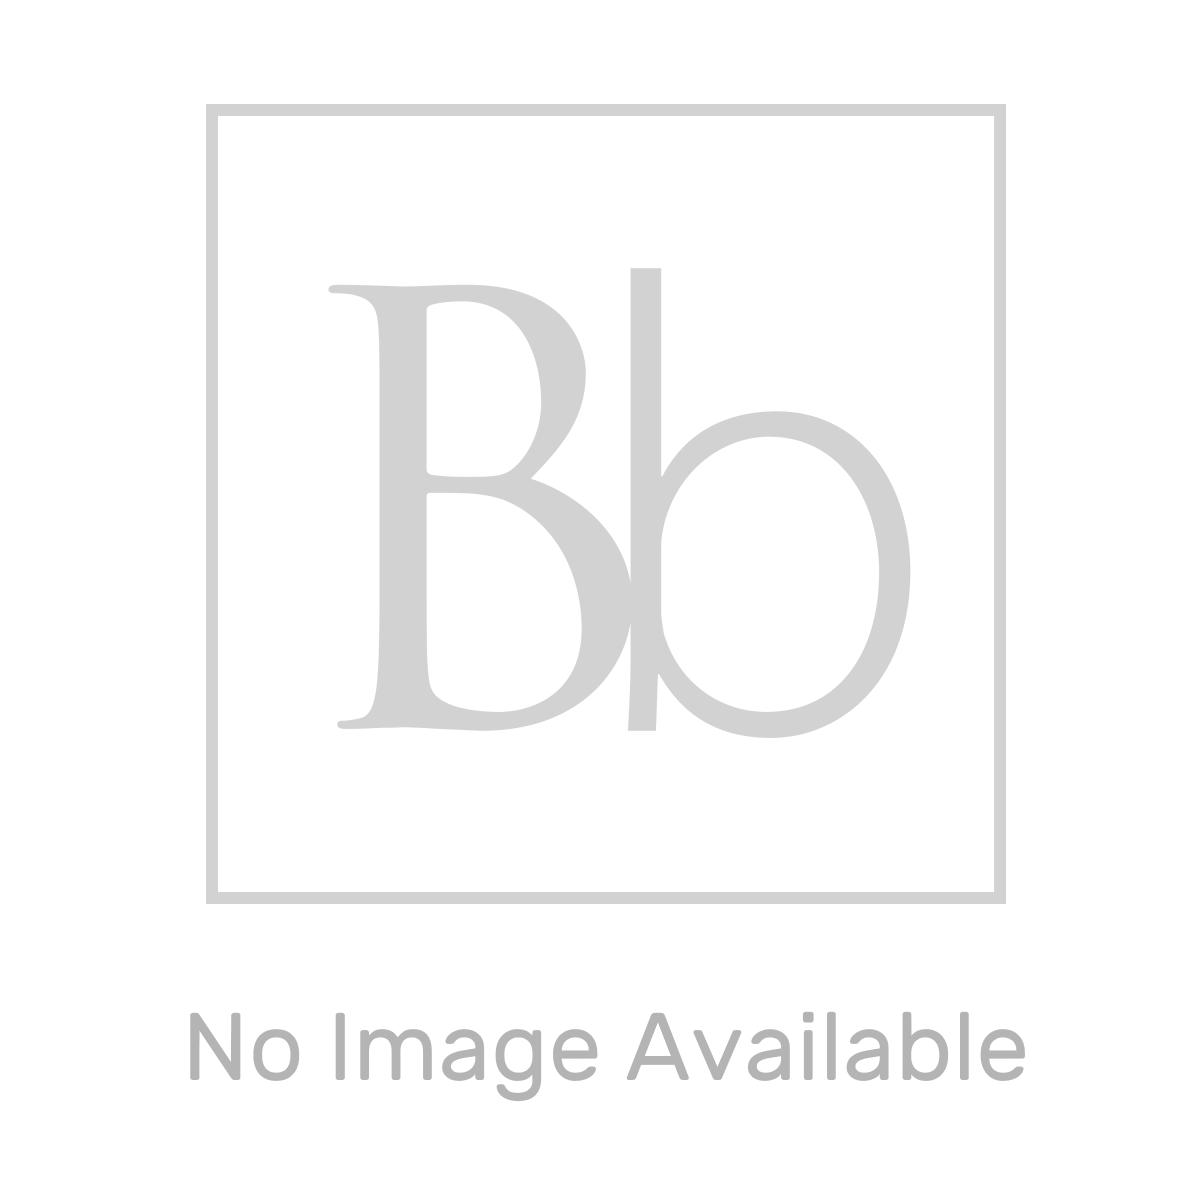 BTL Volta White Gloss Wood Effect End Bath Panel 700mm